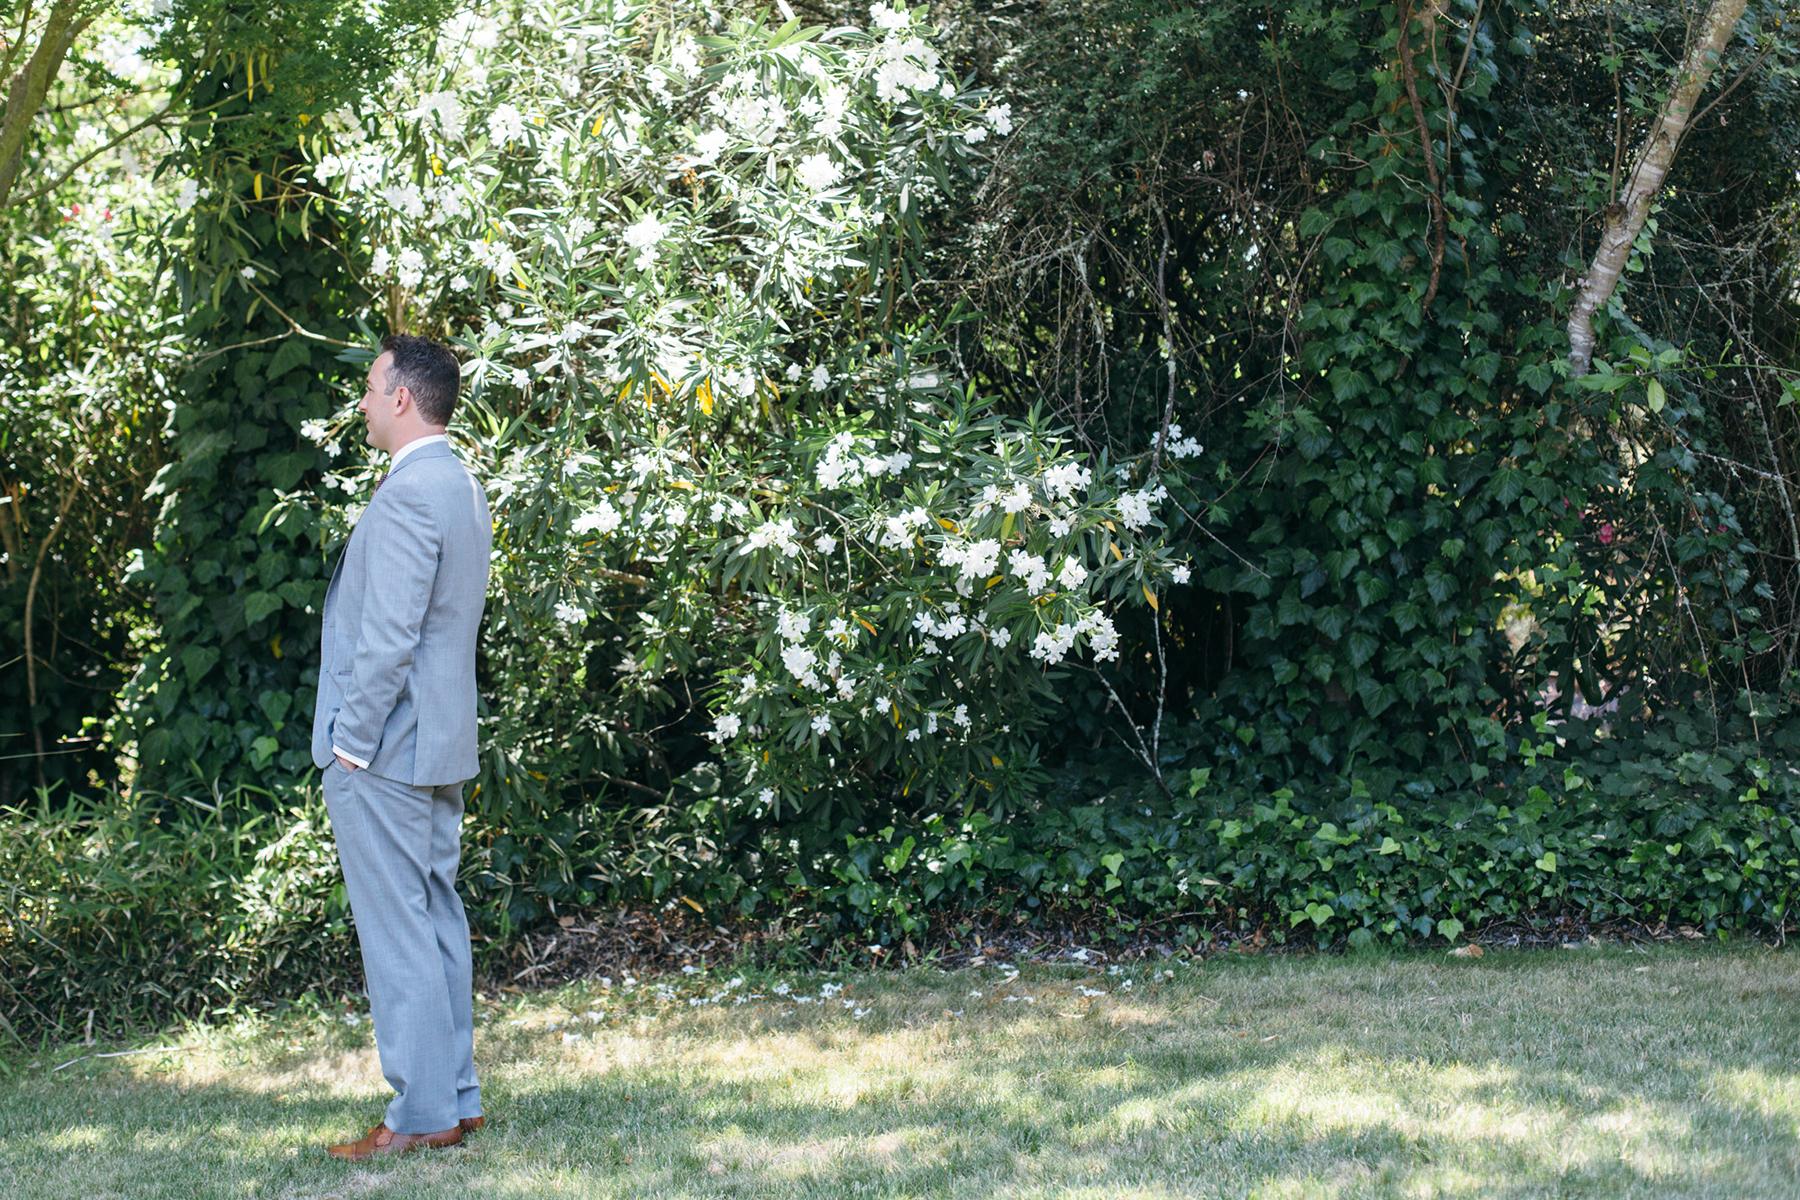 dallas-haley-napa-wedding-photographer-11.jpg